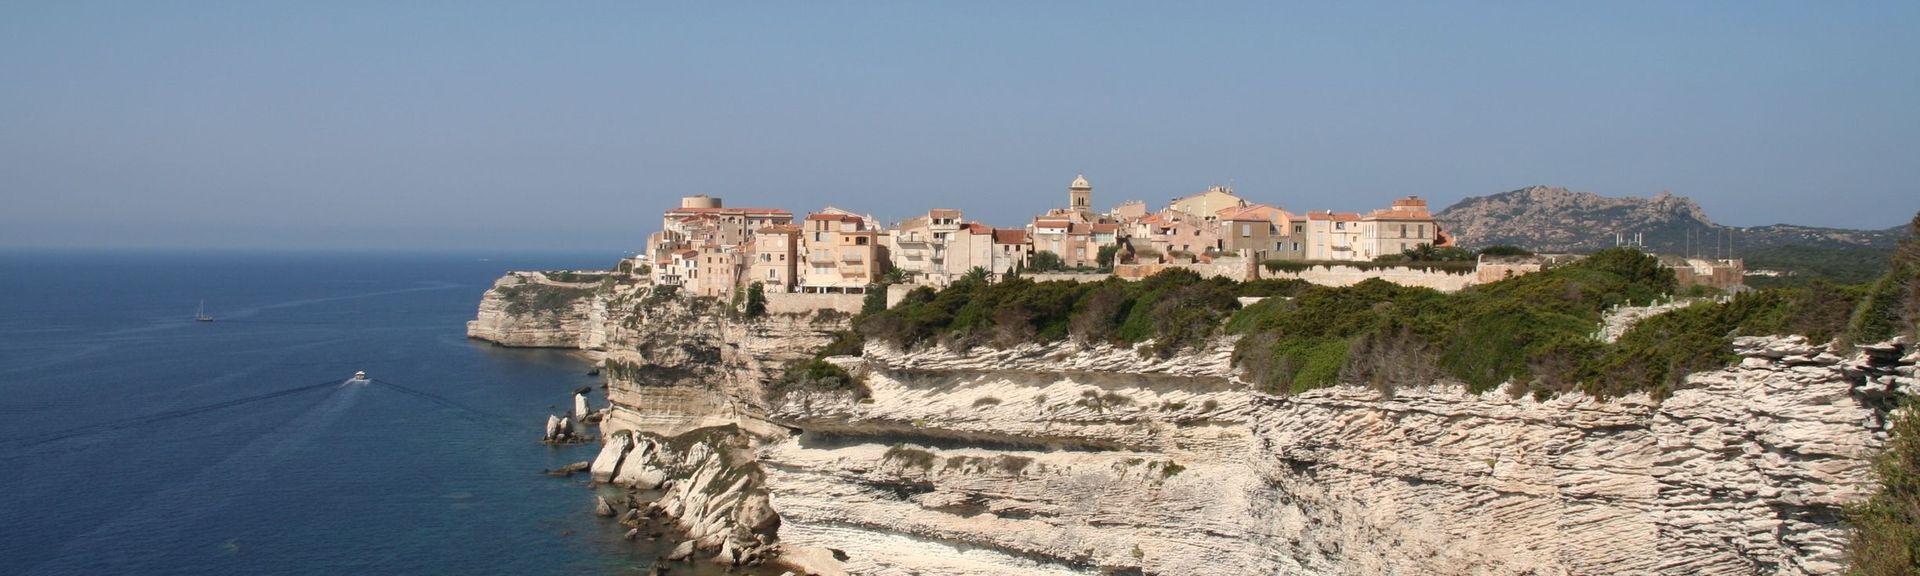 Bonifacio Citadel, Bonifacio, Corse-du-Sud, France